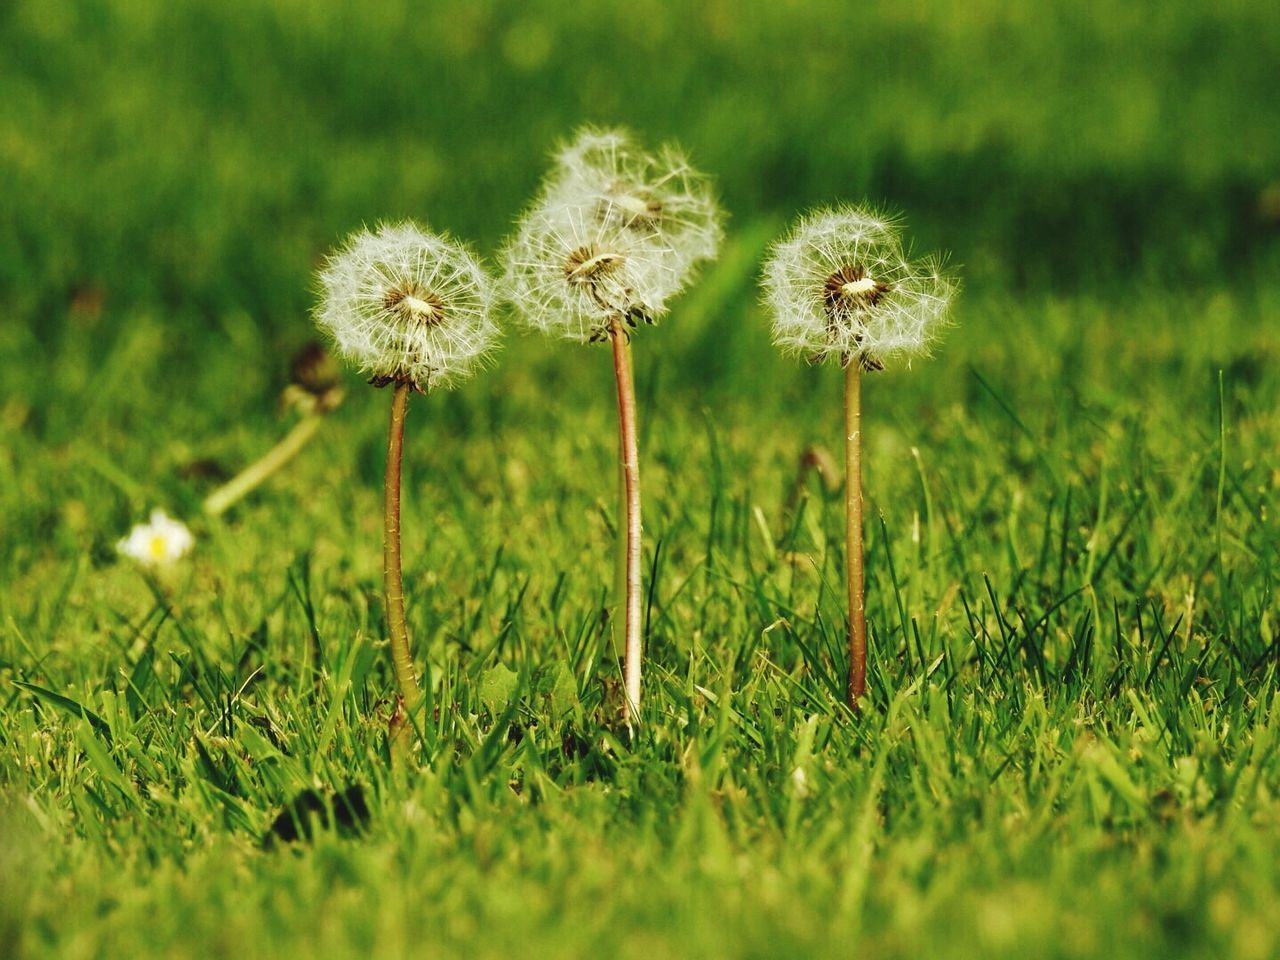 Dandelion Fragility Beauty In Nature Growth Flower Head Grass Freshness Garden Seeds